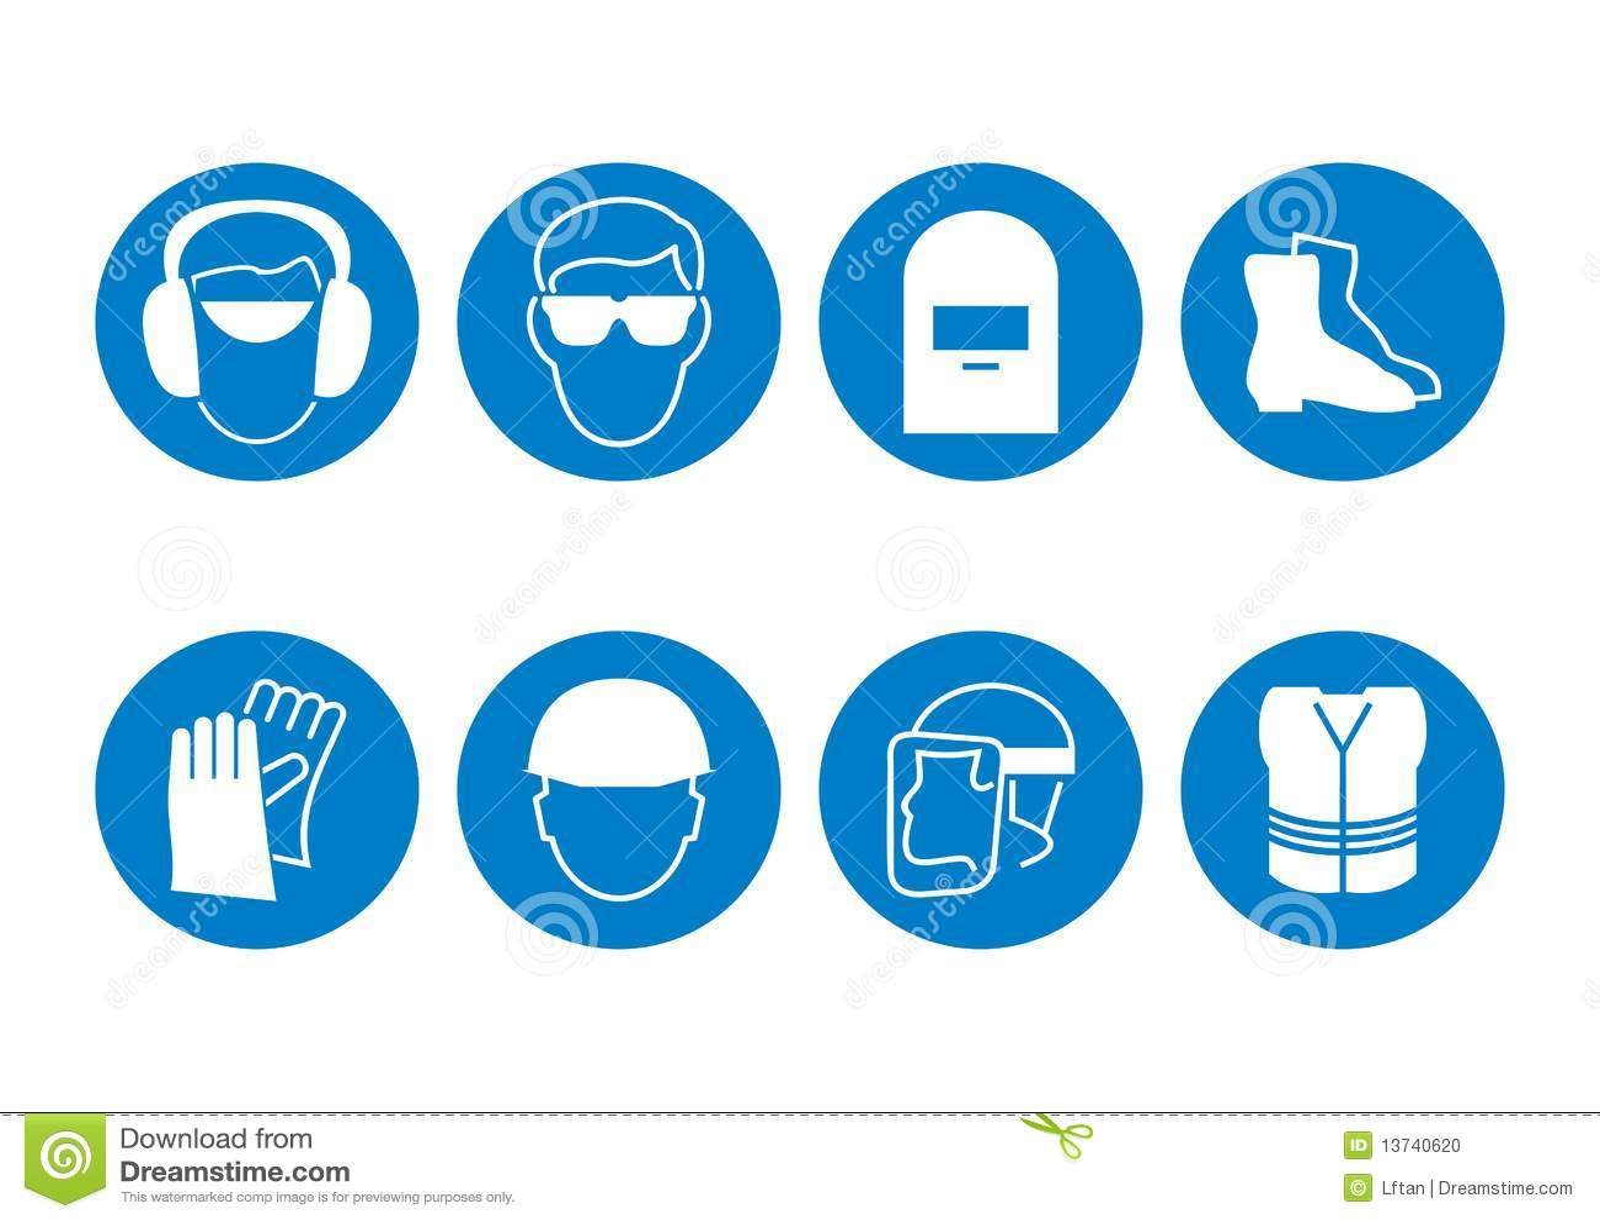 Construction Safety Symbols Stock Vector Illustration Of Danger